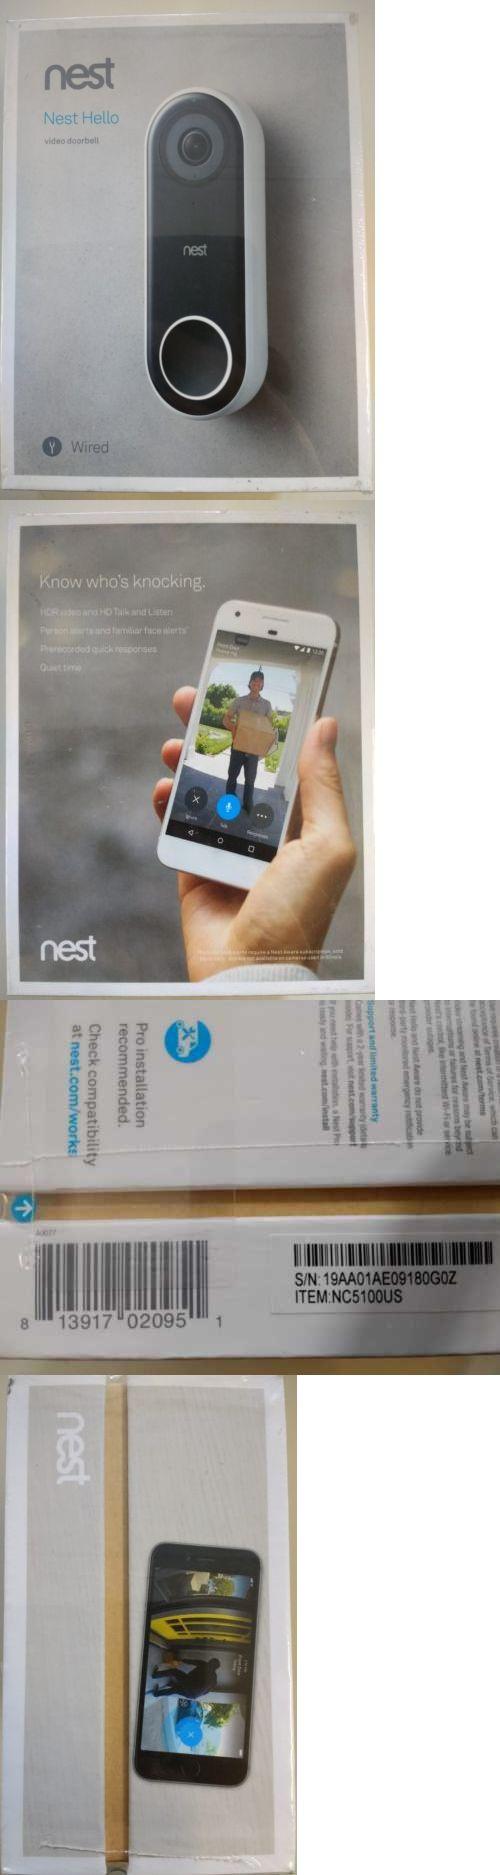 Doorbells 115975: Brand New Sealed Nest Hello Smart Wi-Fi Hd